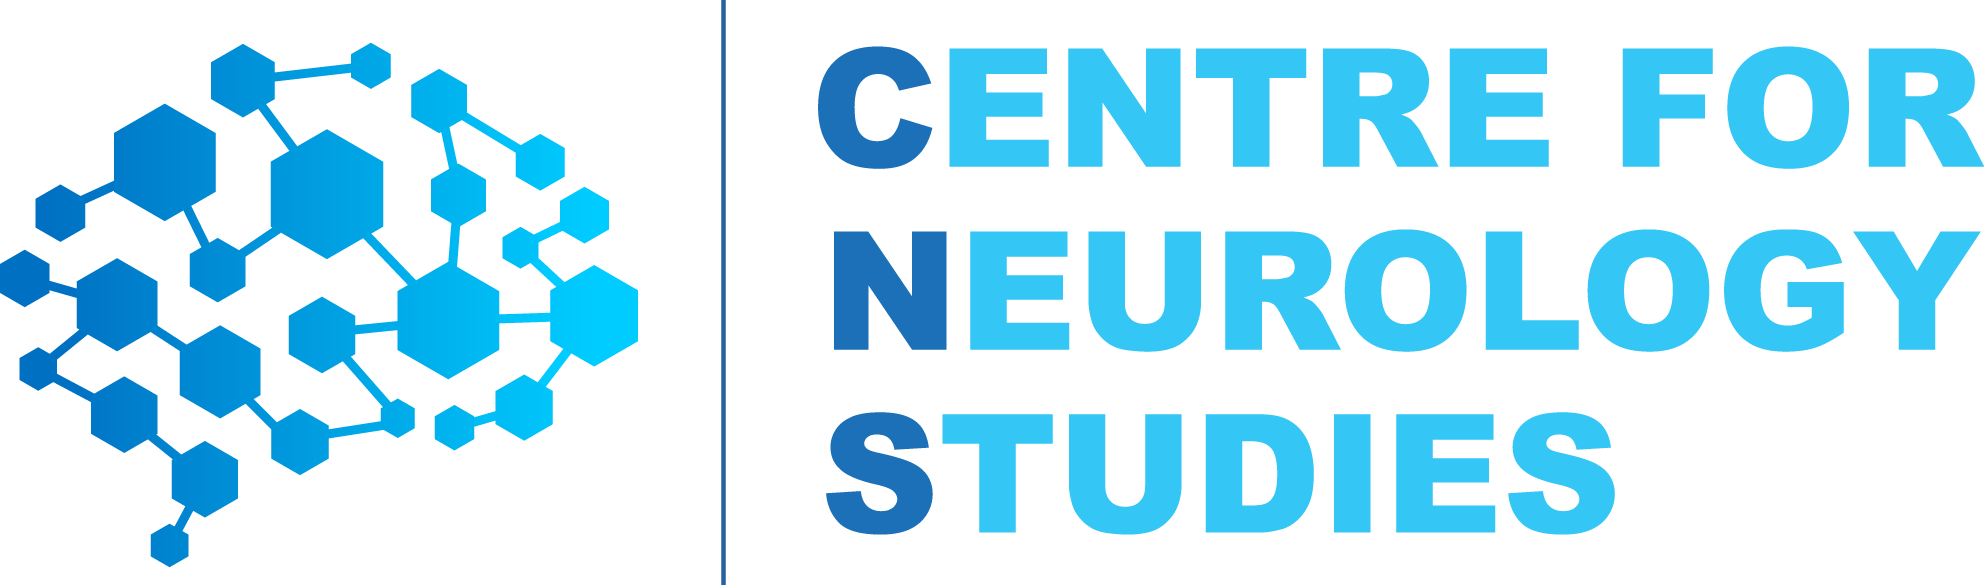 Centre for Neurology Studies